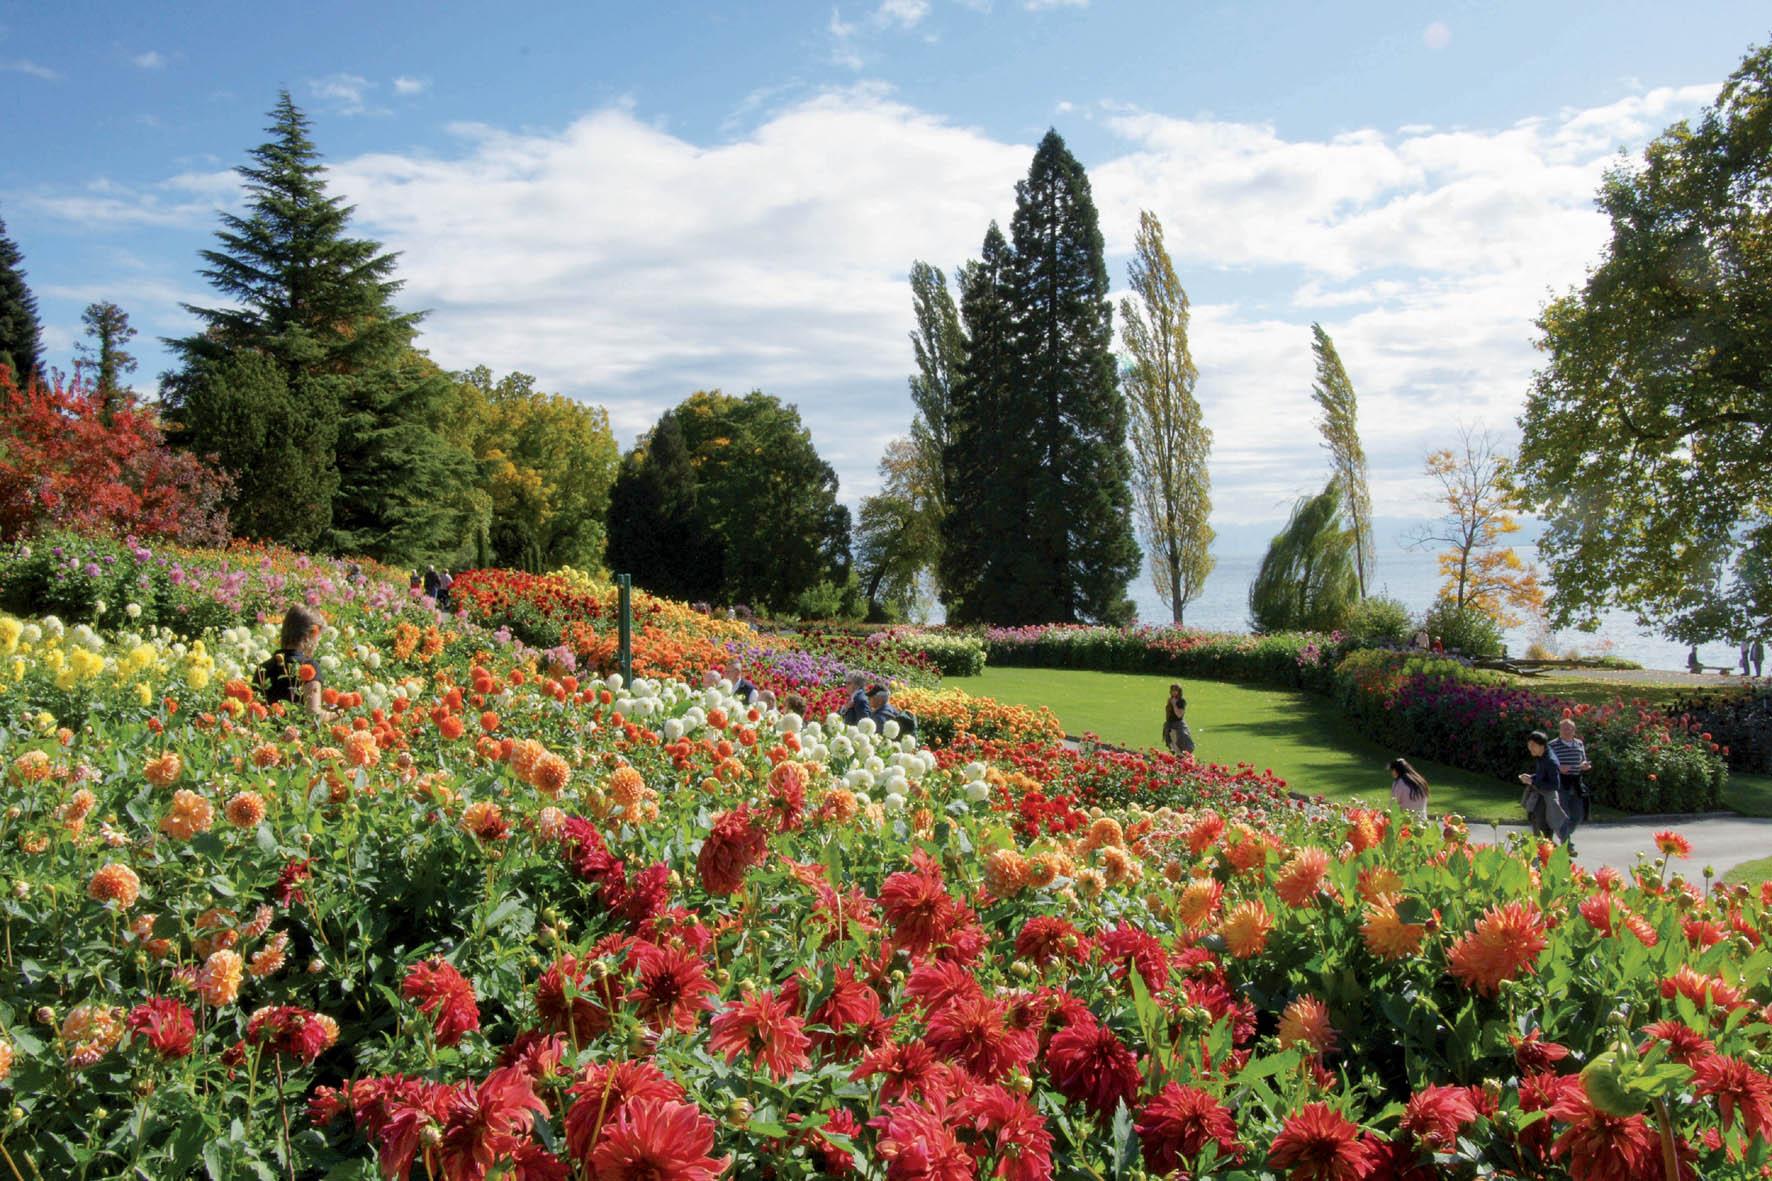 Dahlienblüte im September